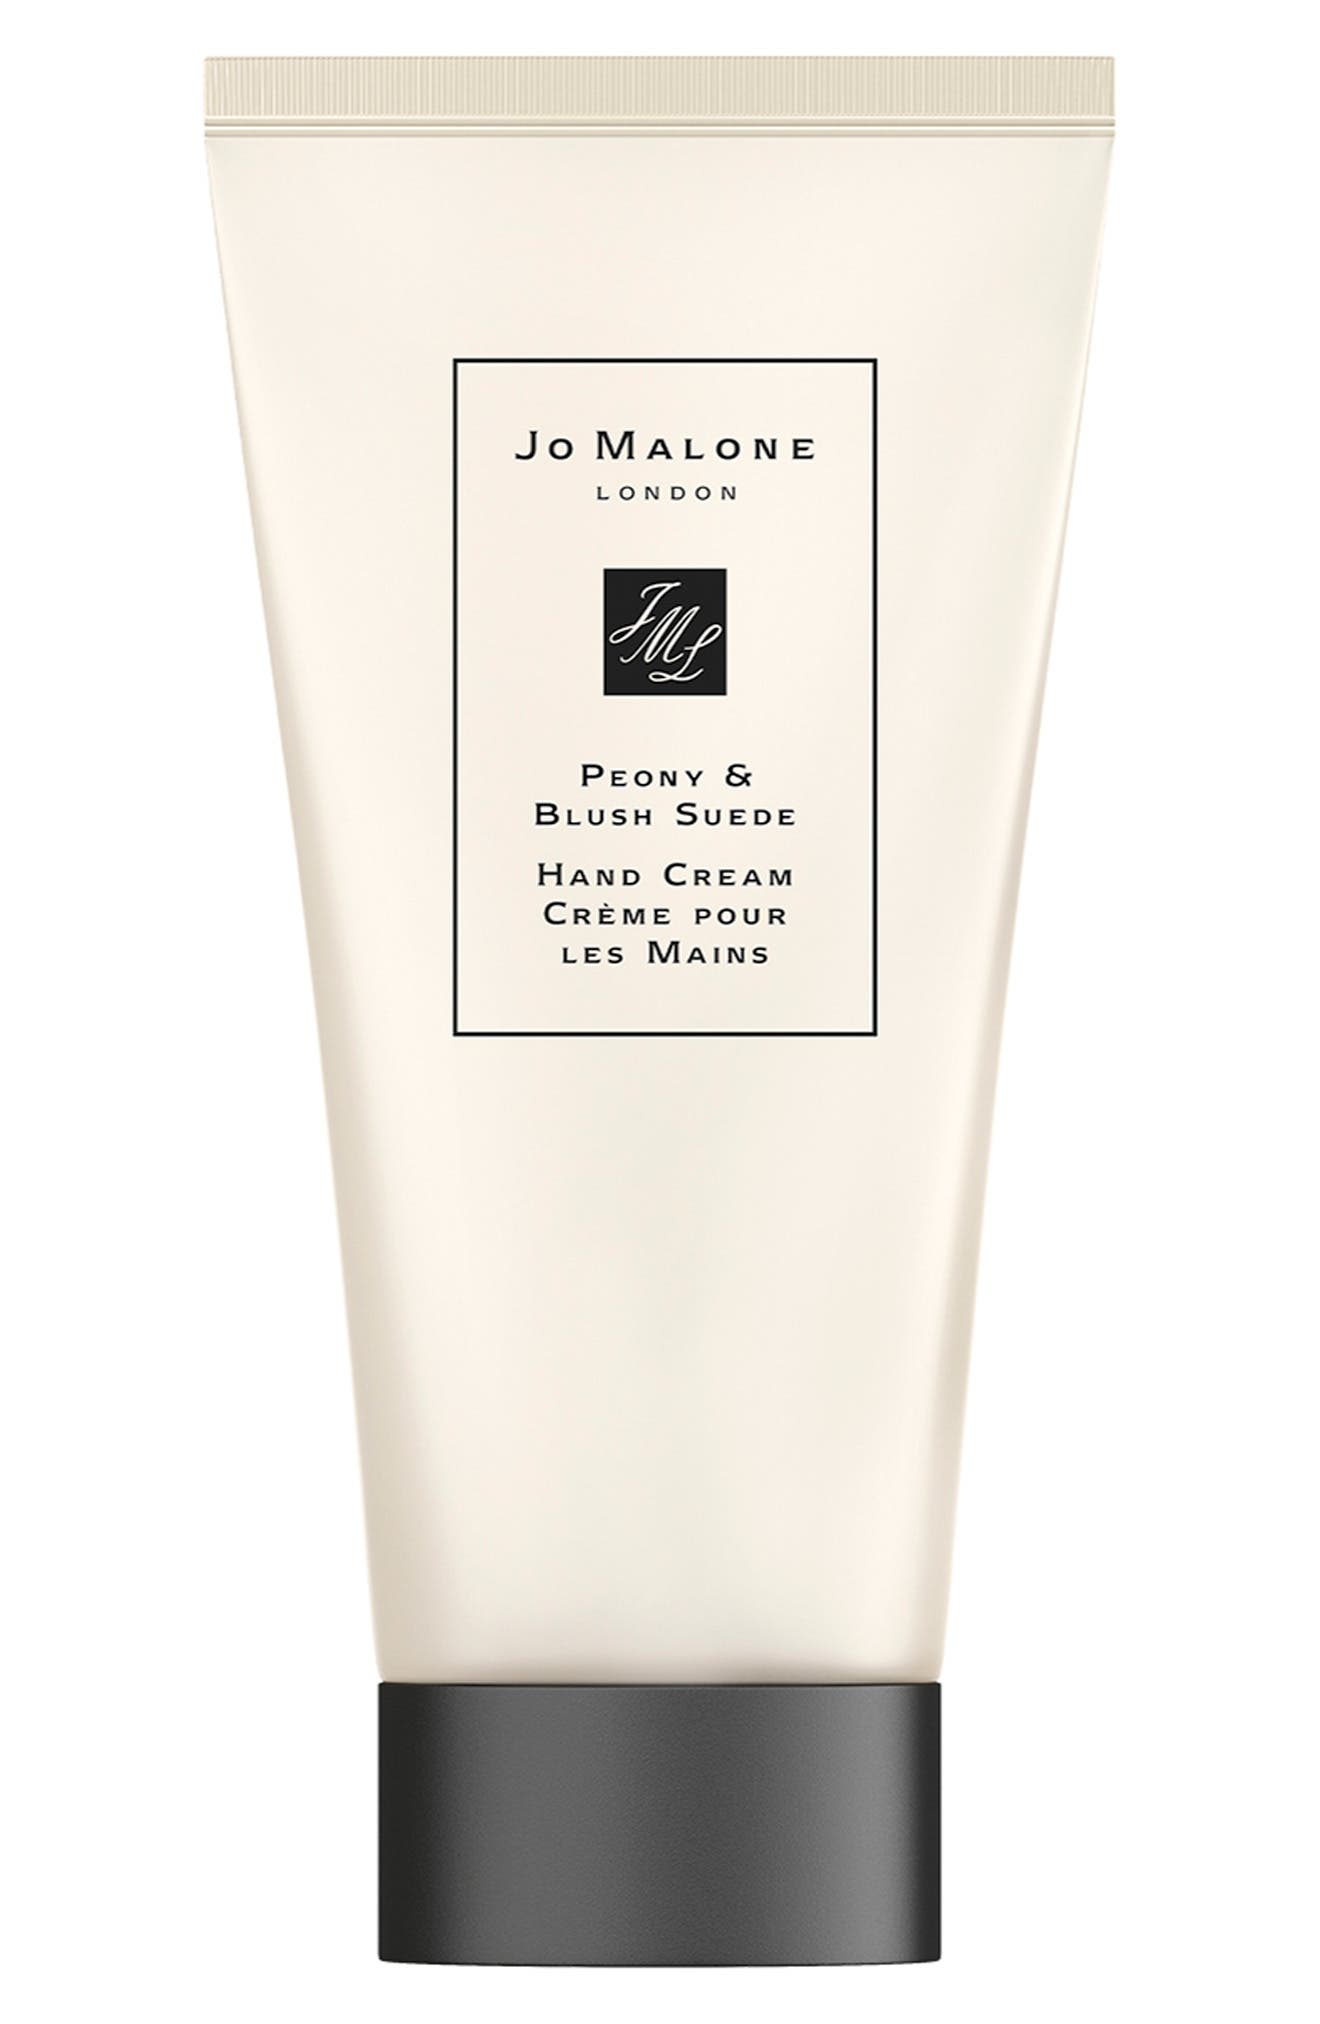 Jo Malone London(TM) Peony & Blush Suede Hand Cream